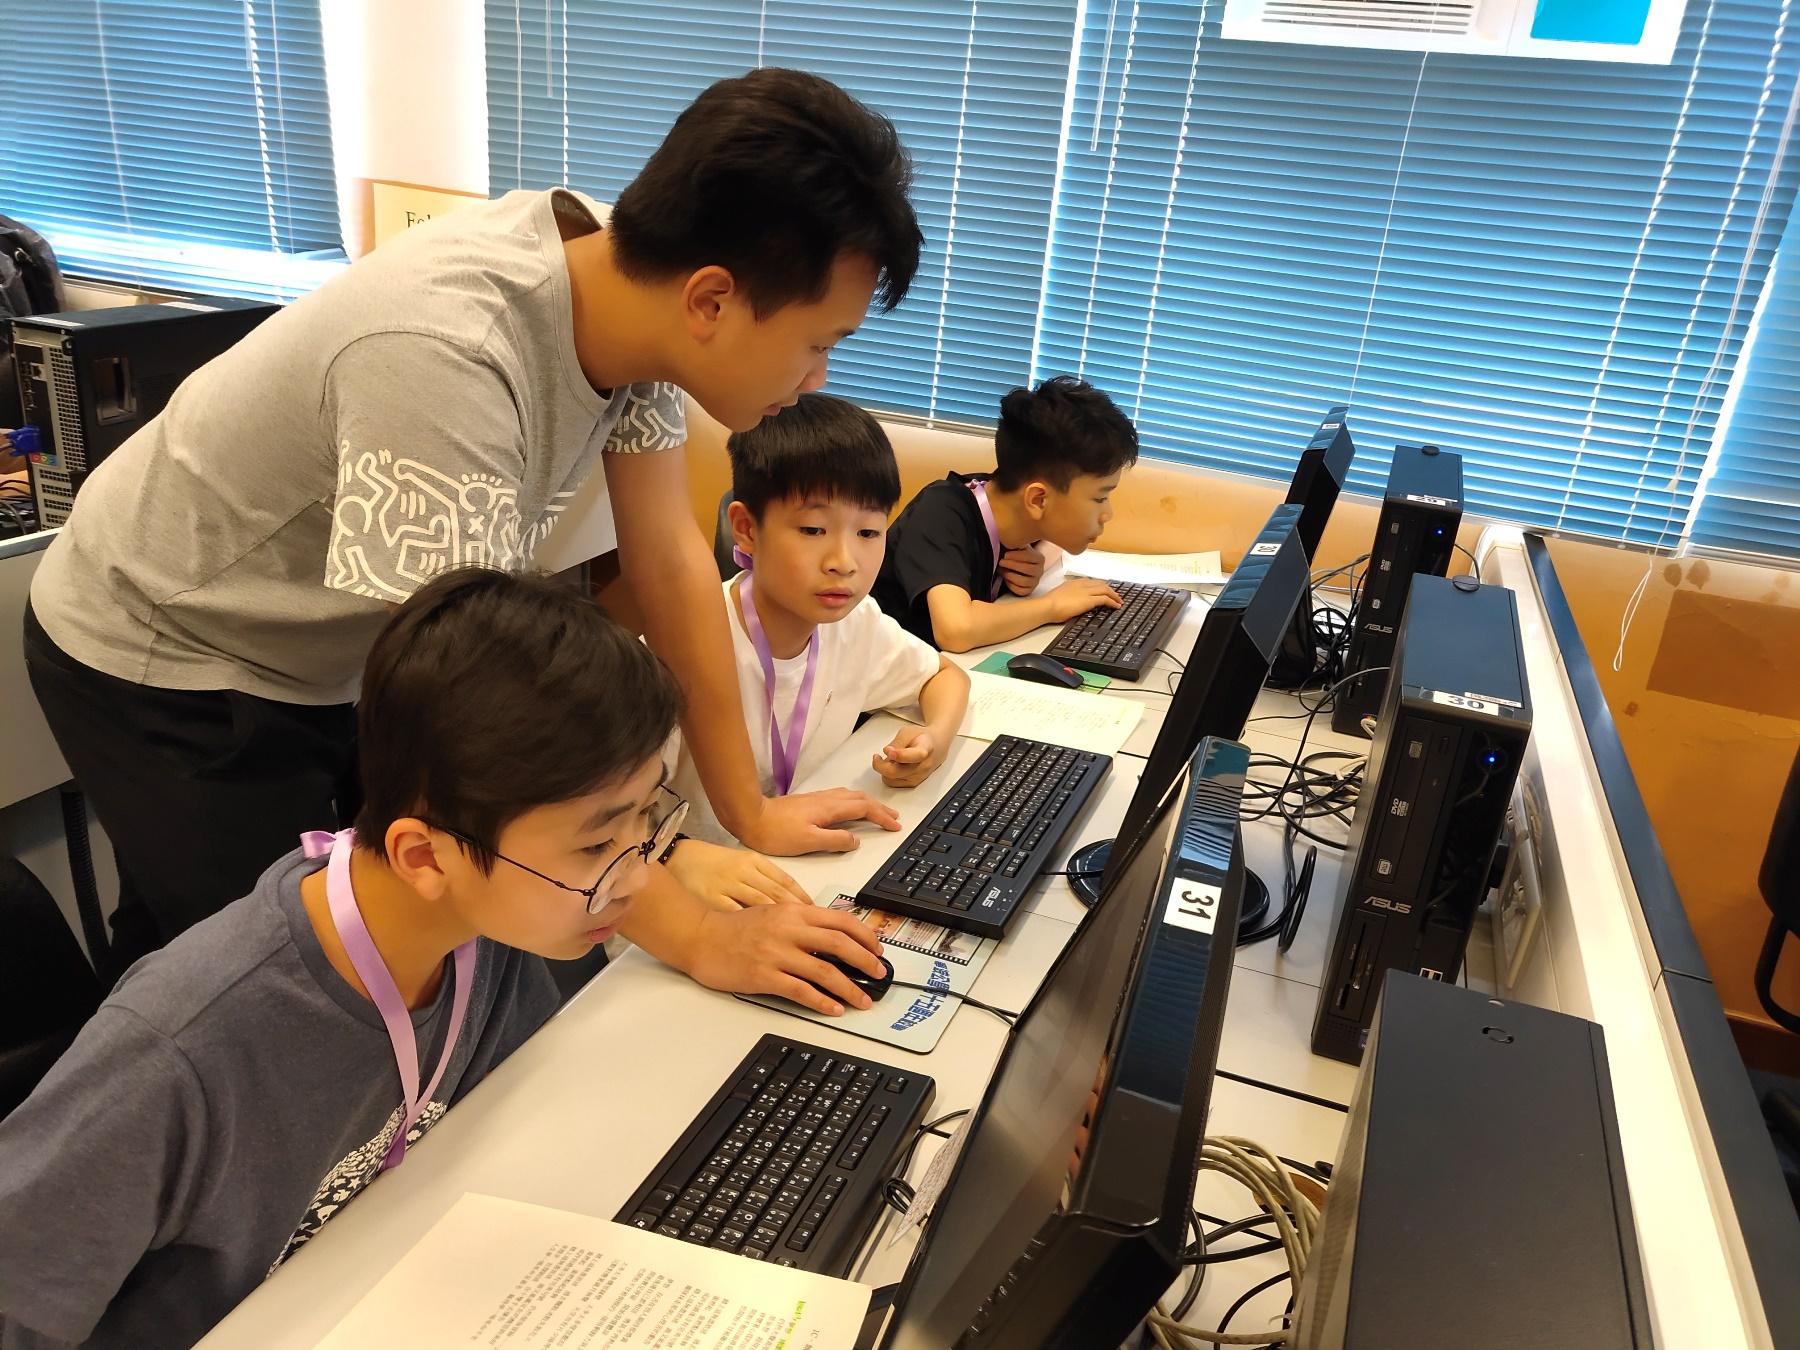 https://npc.edu.hk/sites/default/files/img_20190816_112432.jpg